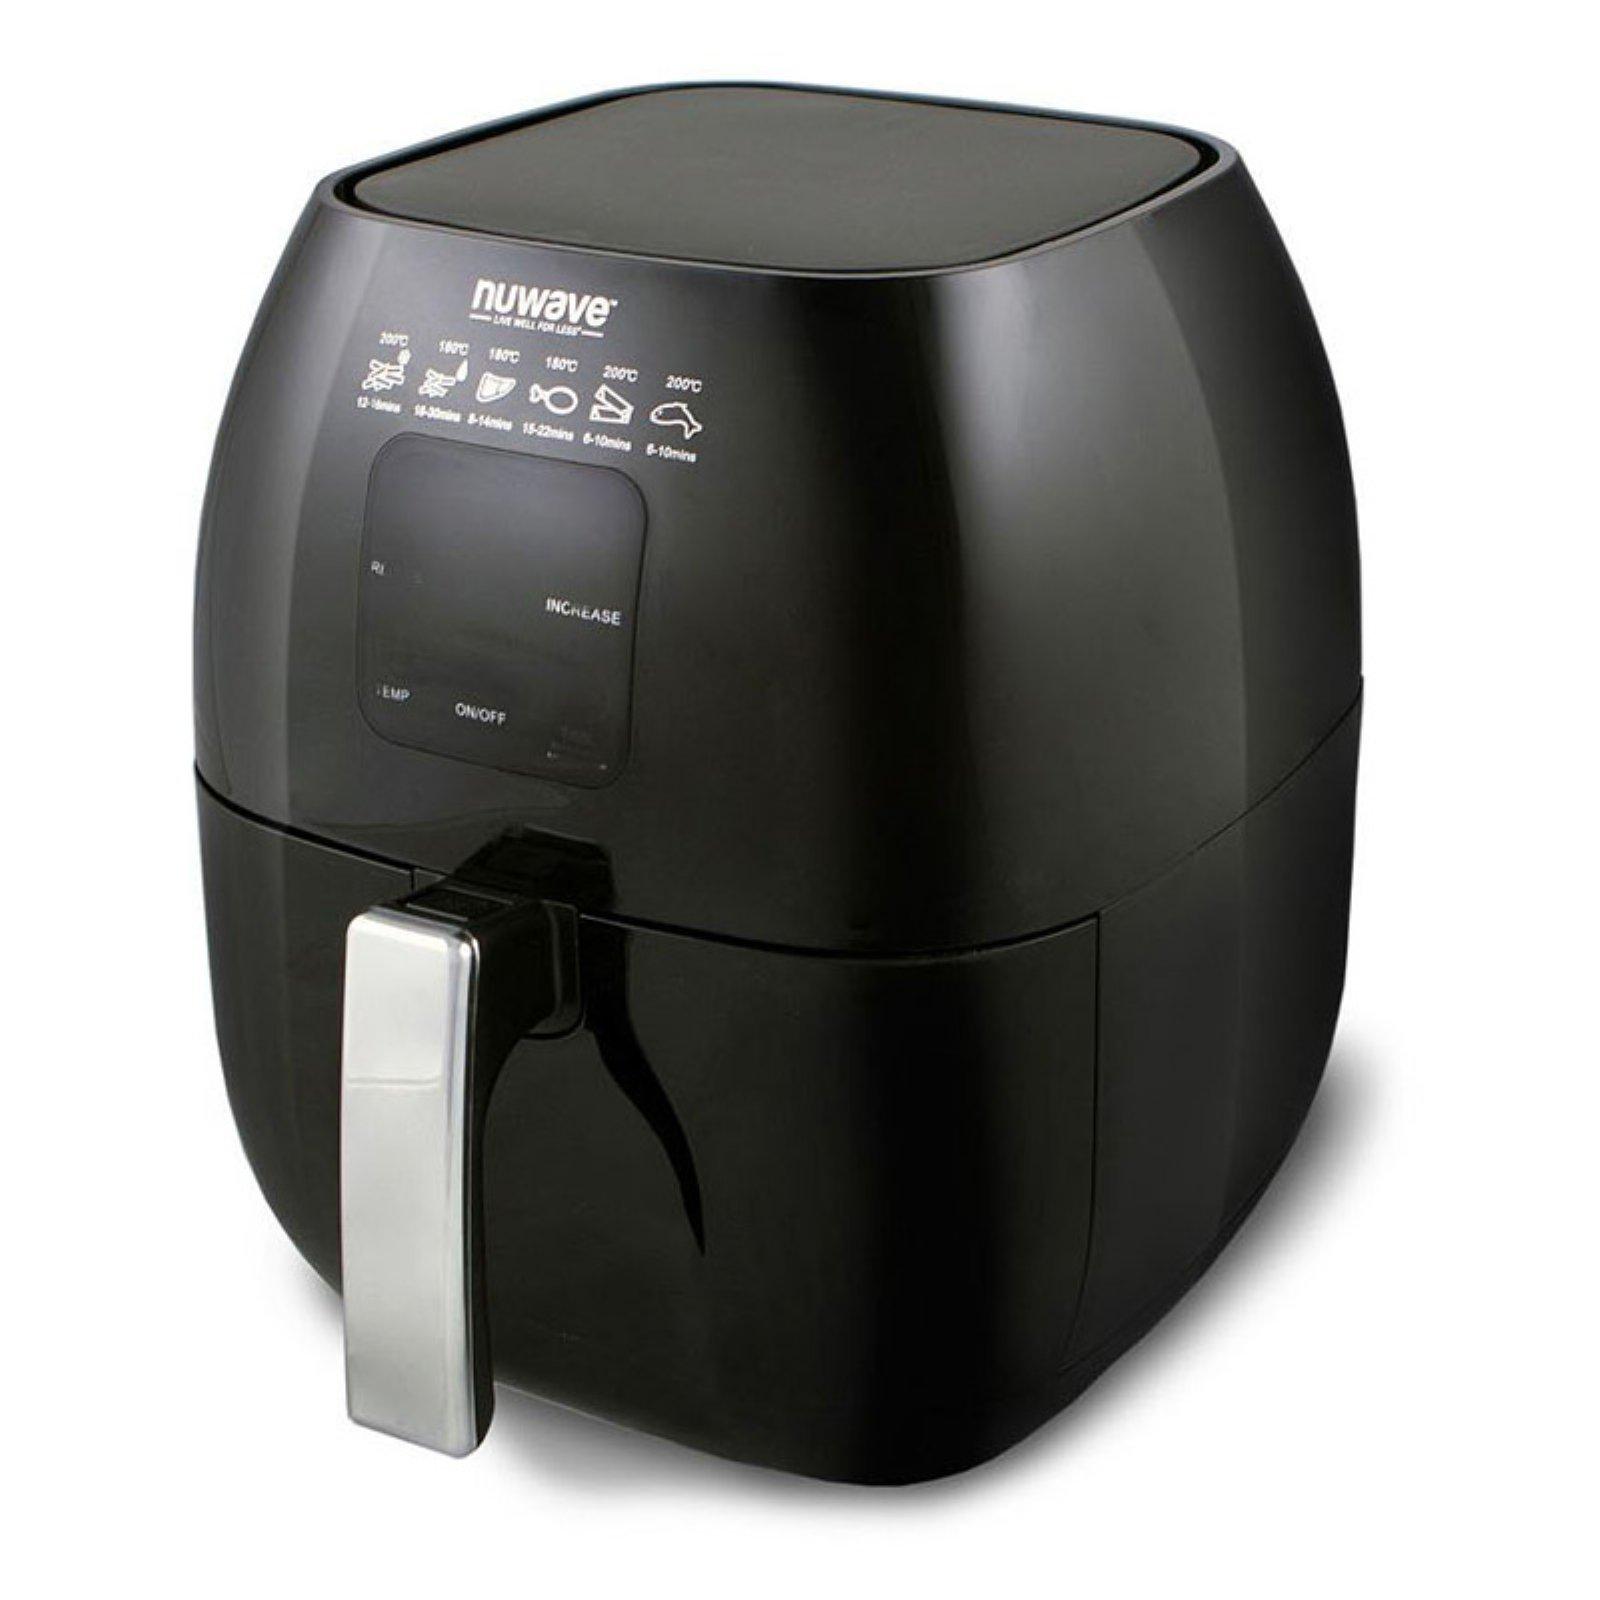 NuWave 3-Quart 2-Piece Non-Stick Air Fryer Only $49.99